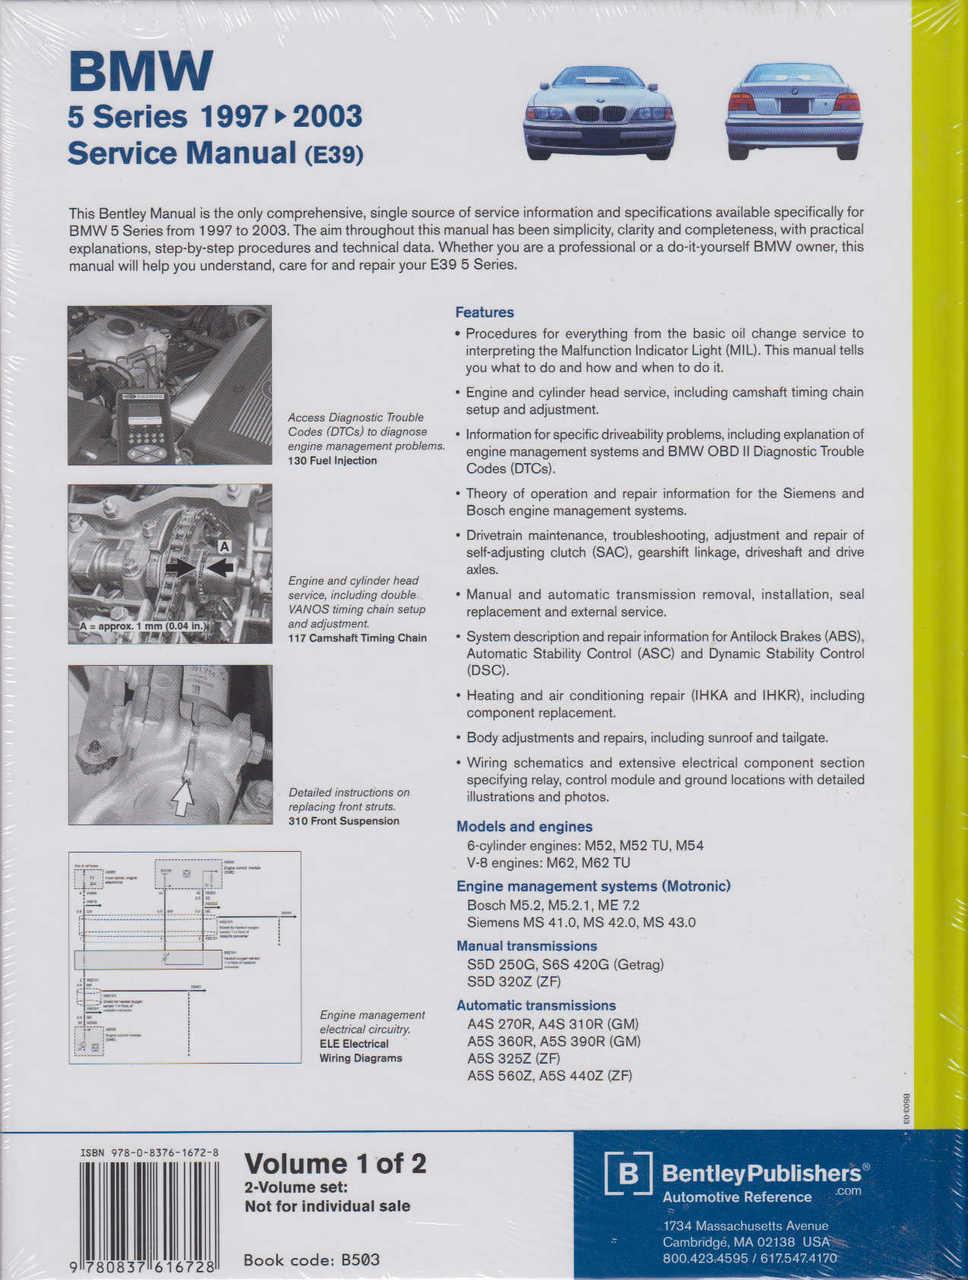 bmw 5 series e39 1997 2003 workshop manual bmw stereo wiring diagram bmw 5 series e39 525i, 528i, 530i, 540i 1997 2003 workshop manual